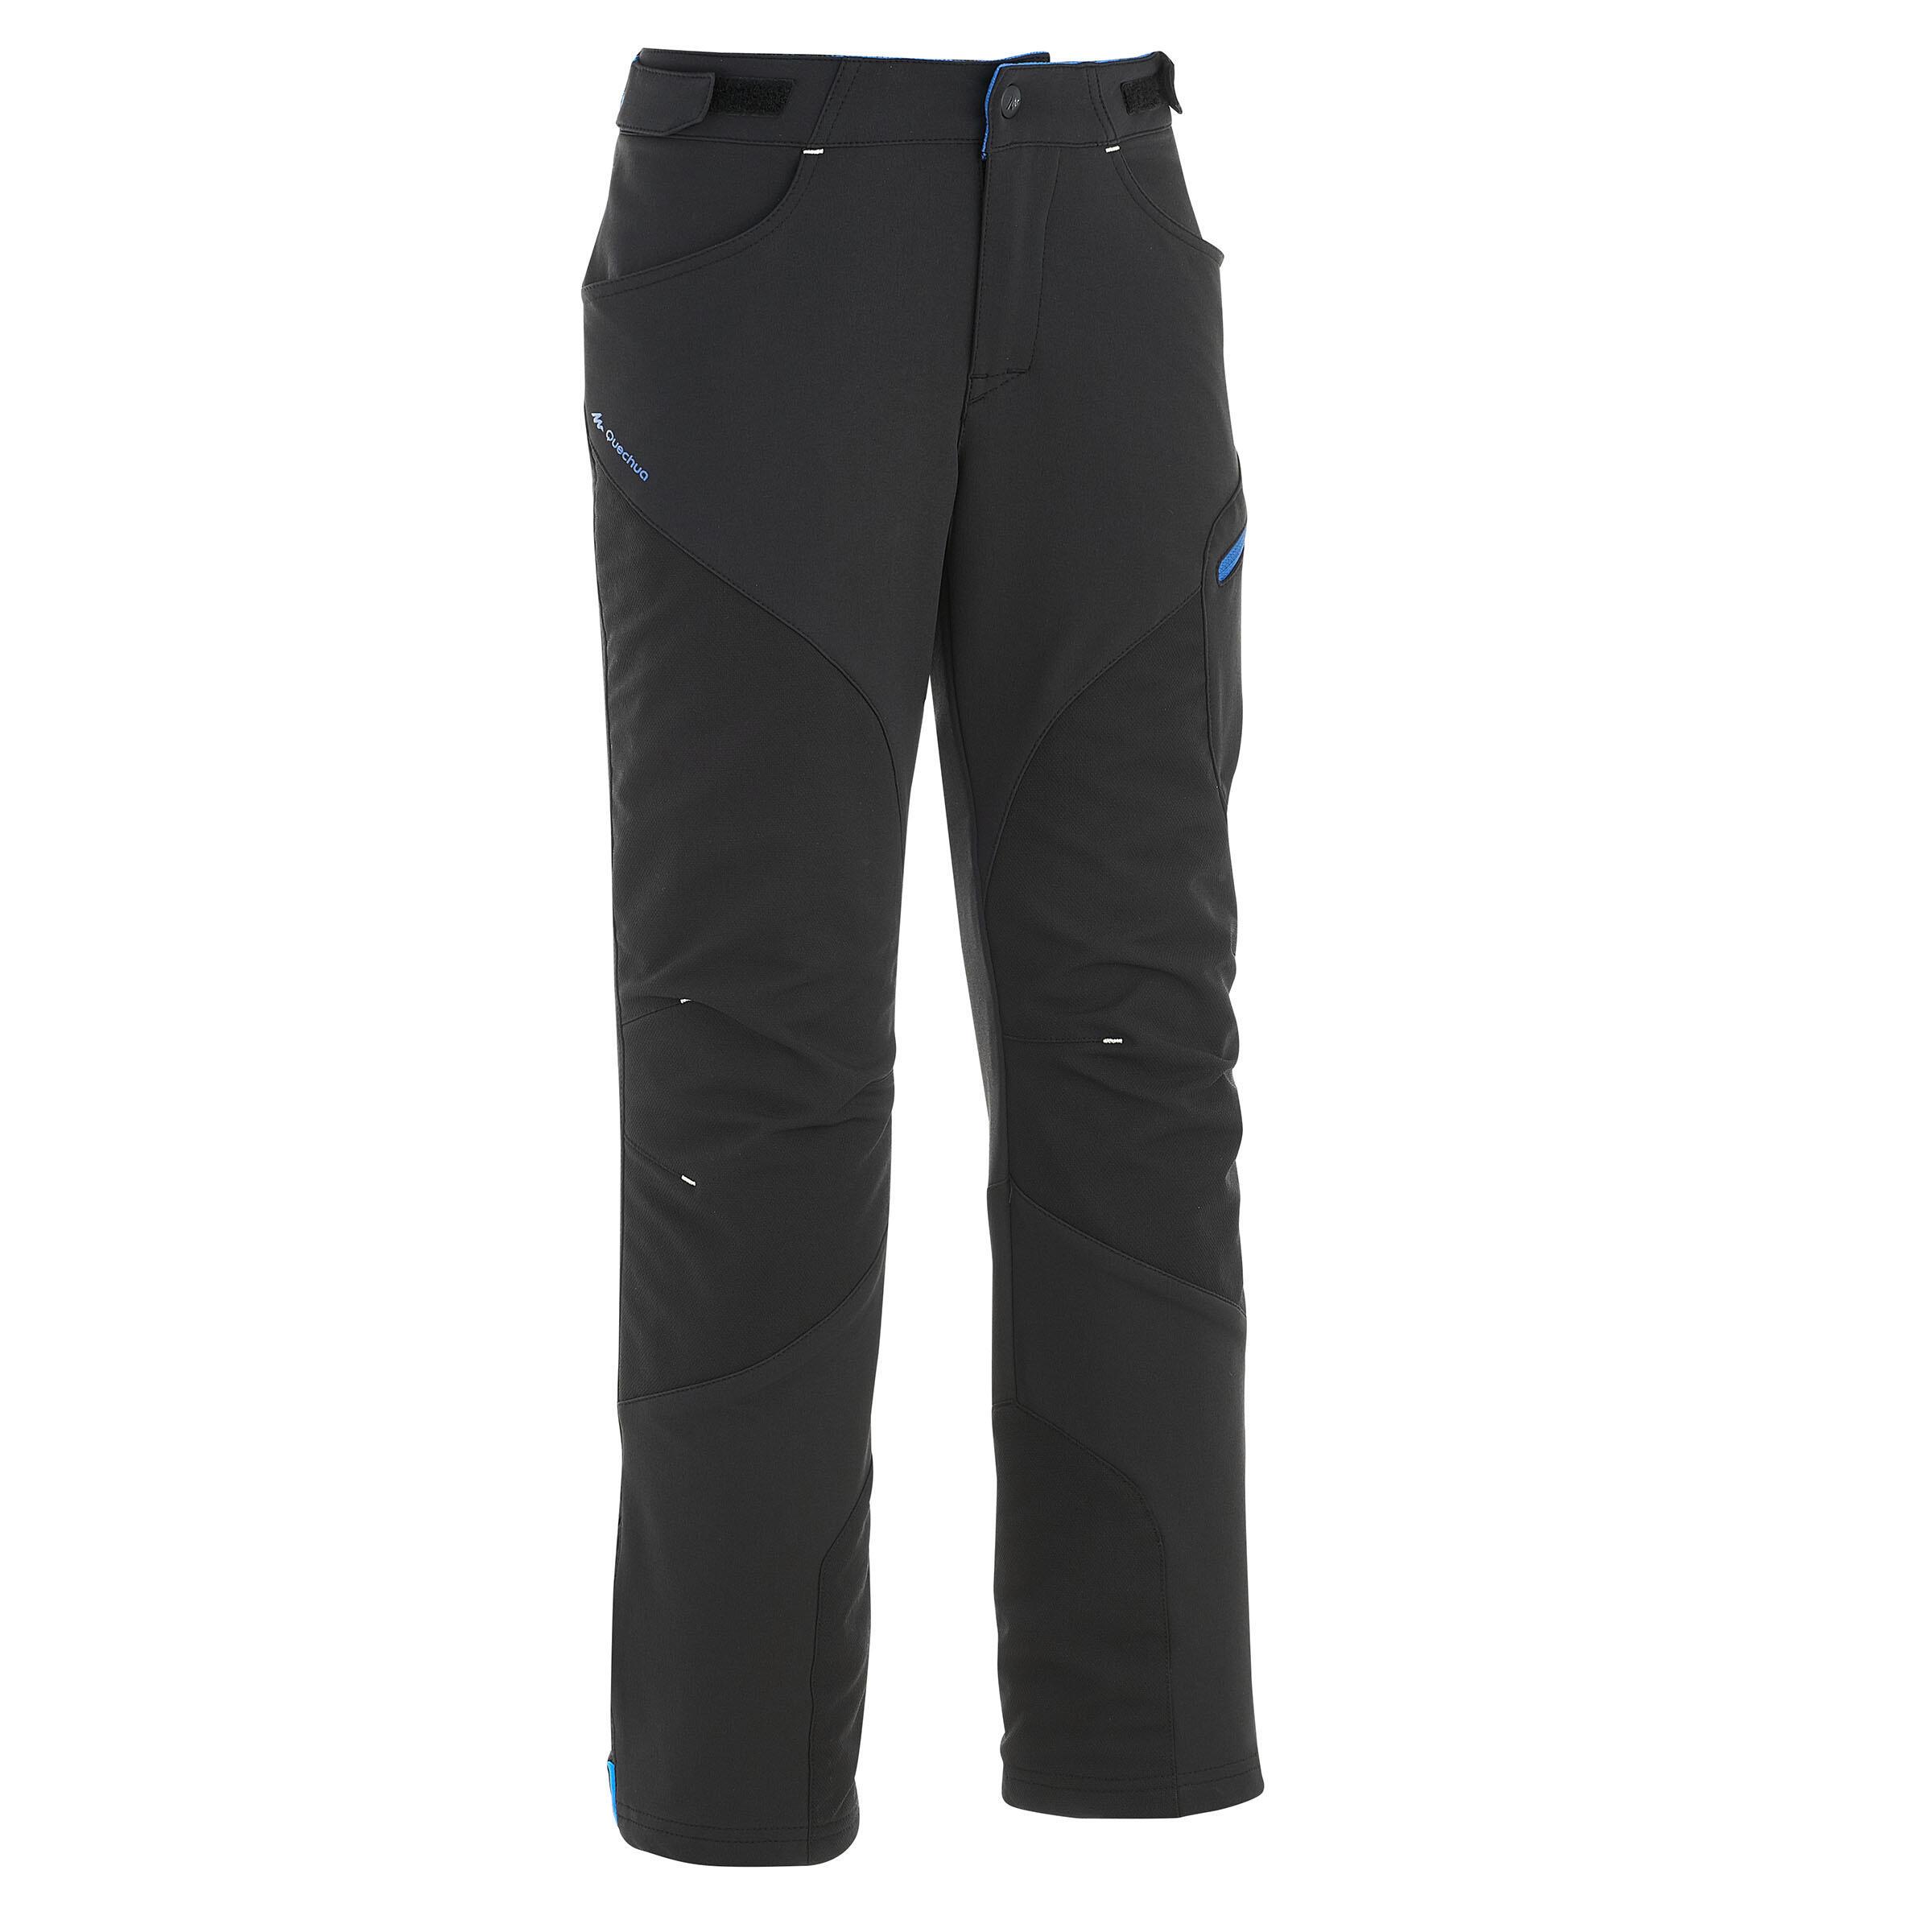 Pantalon MH500 Negru Băieți